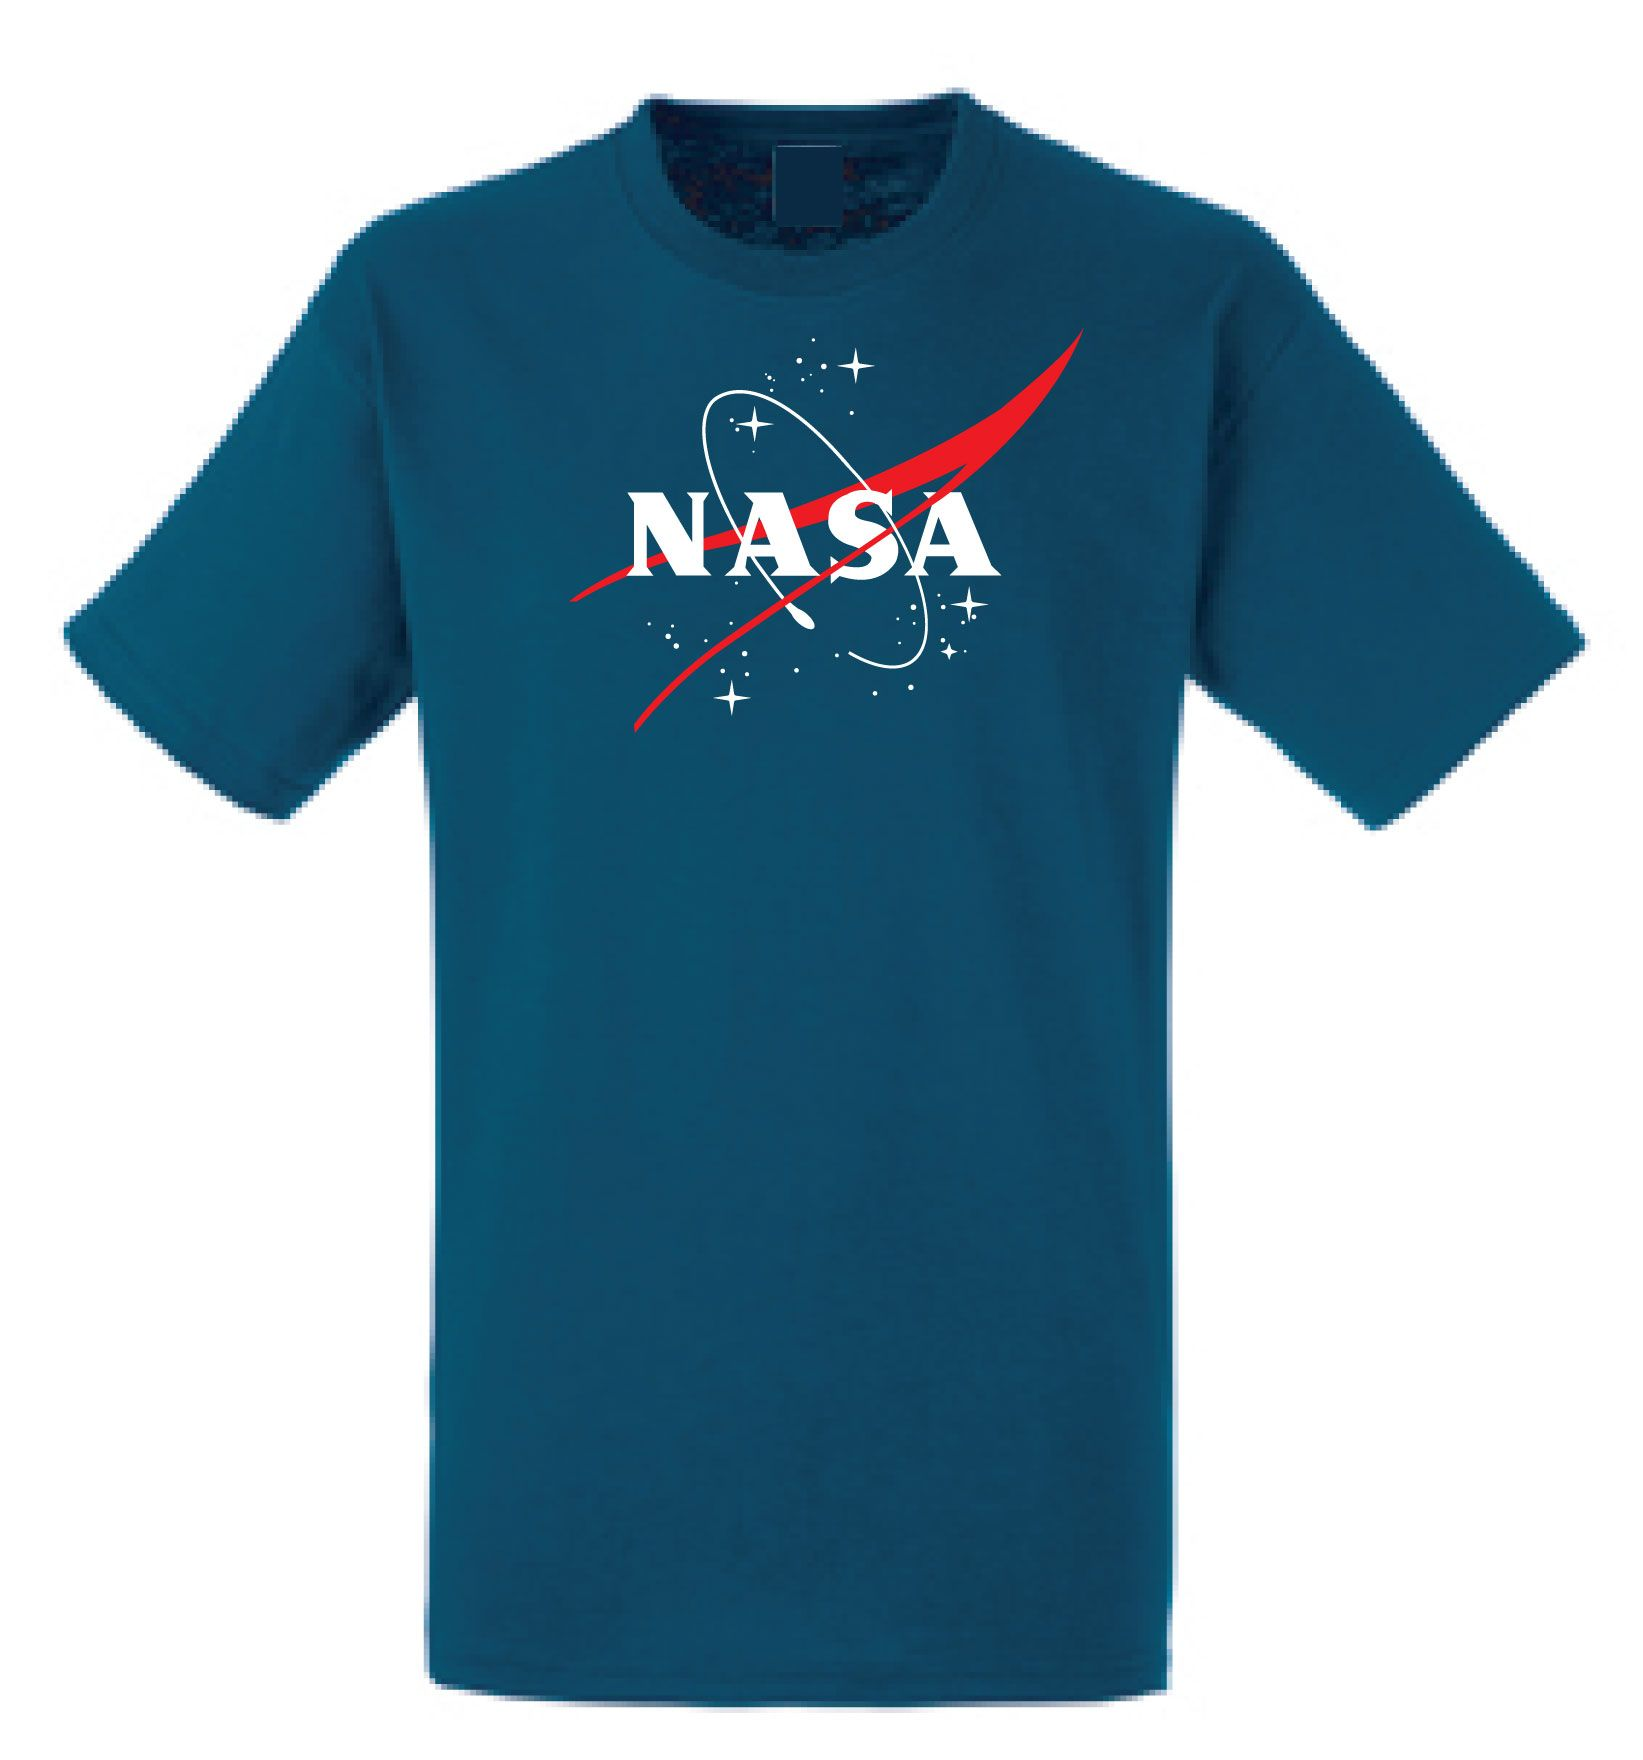 NASA tshirt Space agency Novelty t shirt Mars Mission Curiosity t-shirt